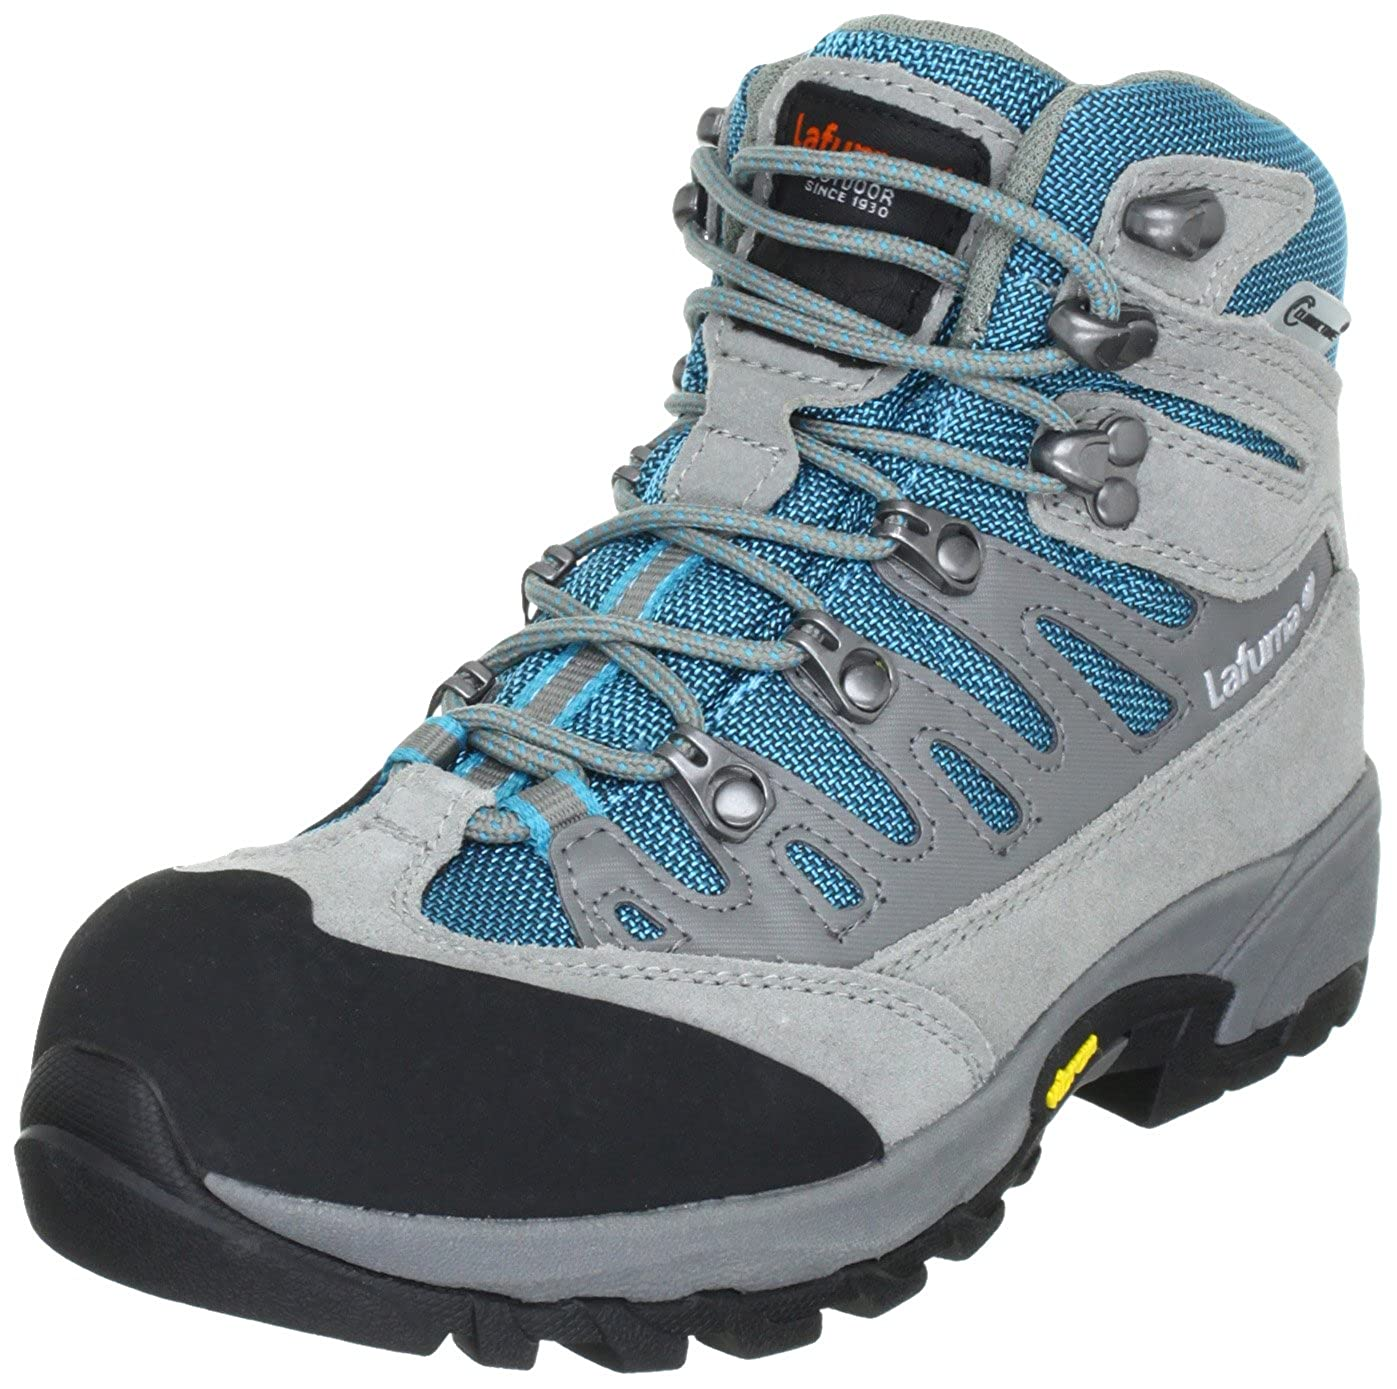 4875c363b212 Lafuma Women s Ld Atakama Florida Blue Hiking Shoe LFG1899 4 UK   Amazon.co.uk  Shoes   Bags